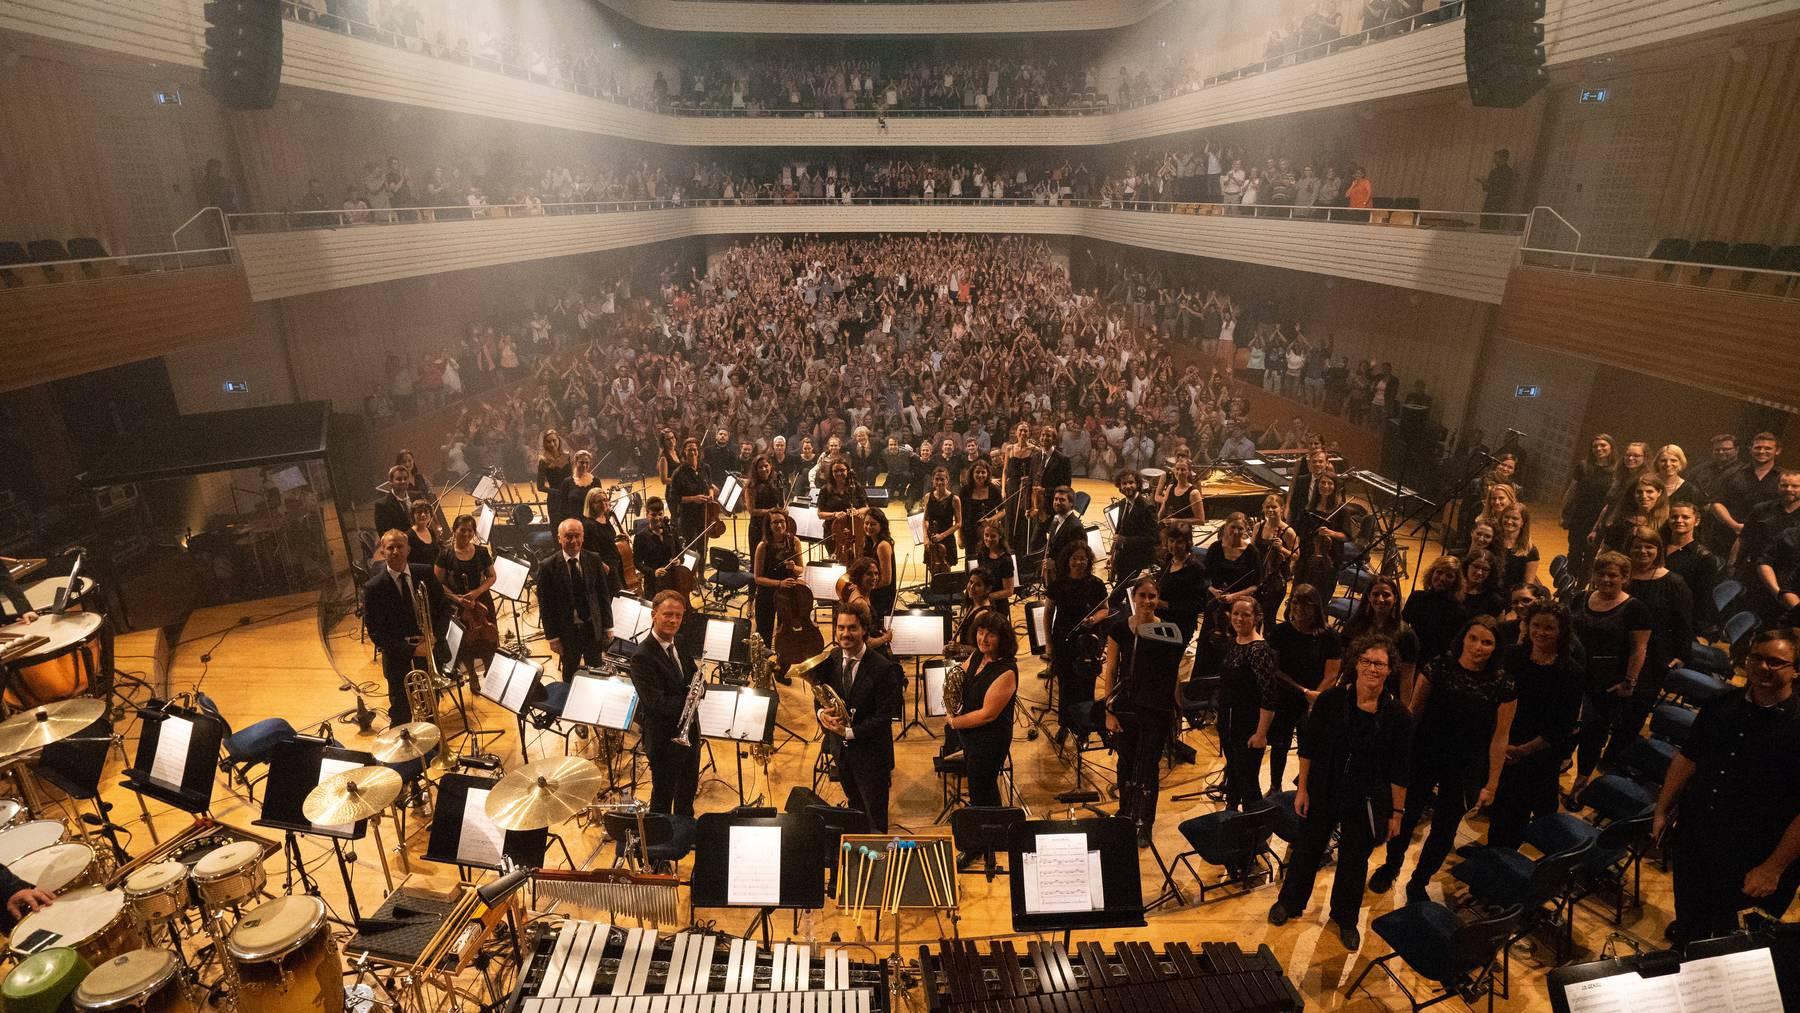 Radio Pilatus Music Night mit dem 21st Century Orchestra & Chorus und Lo & Leduc im KKL Luzern